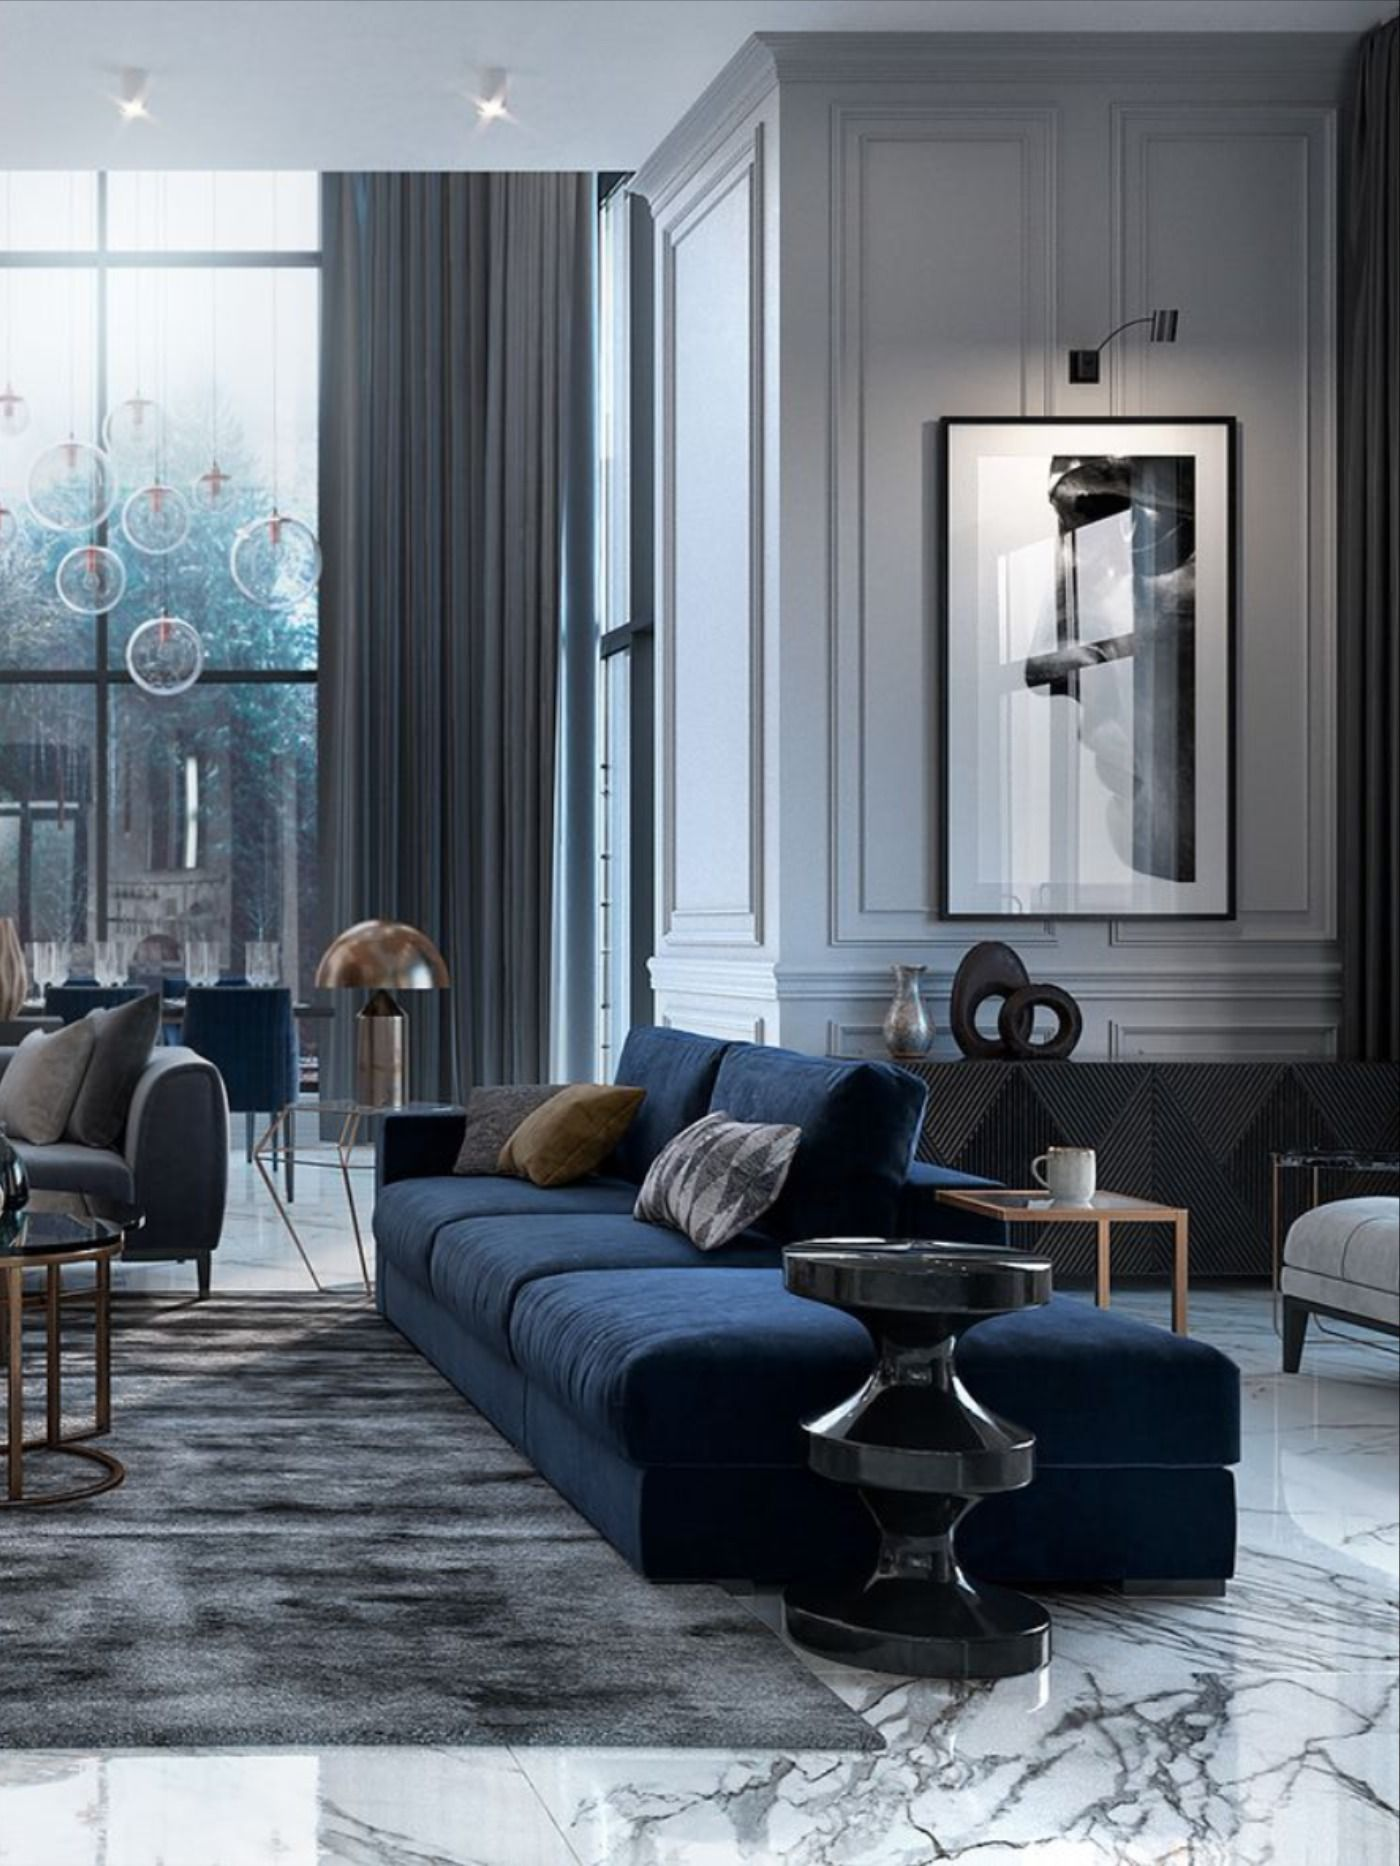 Studia 54 With Boca Do Lobo Boost Luxury Home Decor Living Room Designs Trendy Living Rooms New living room designs